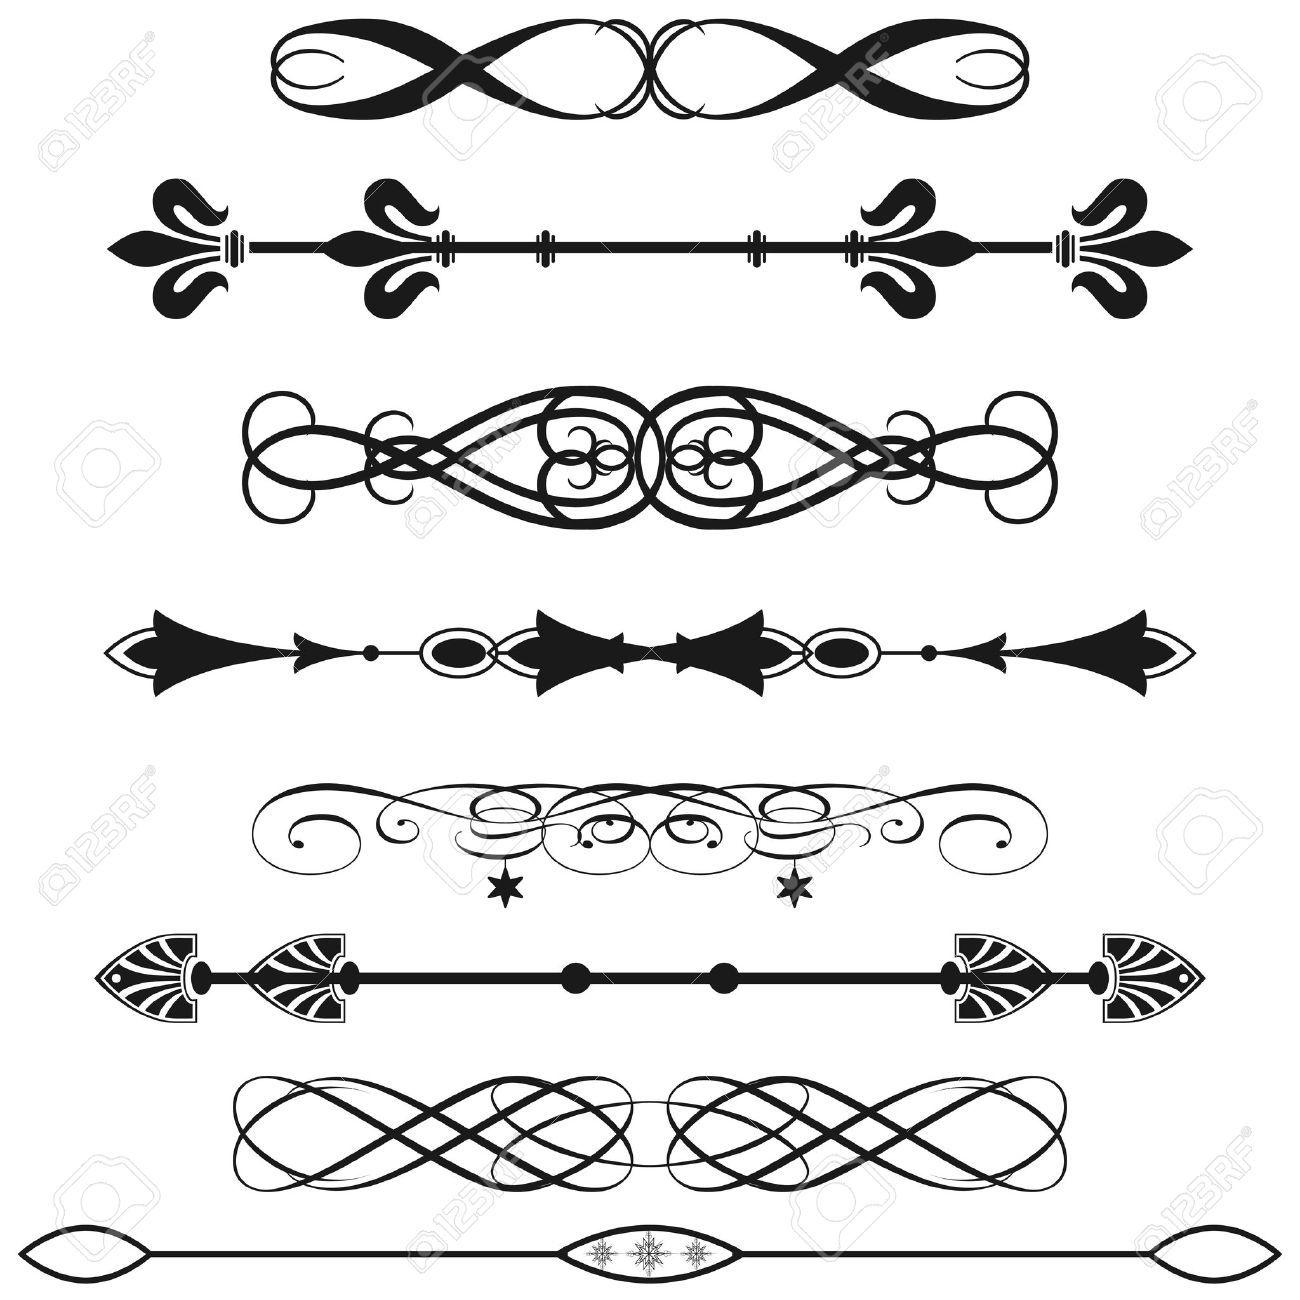 Horizontal Line Designs